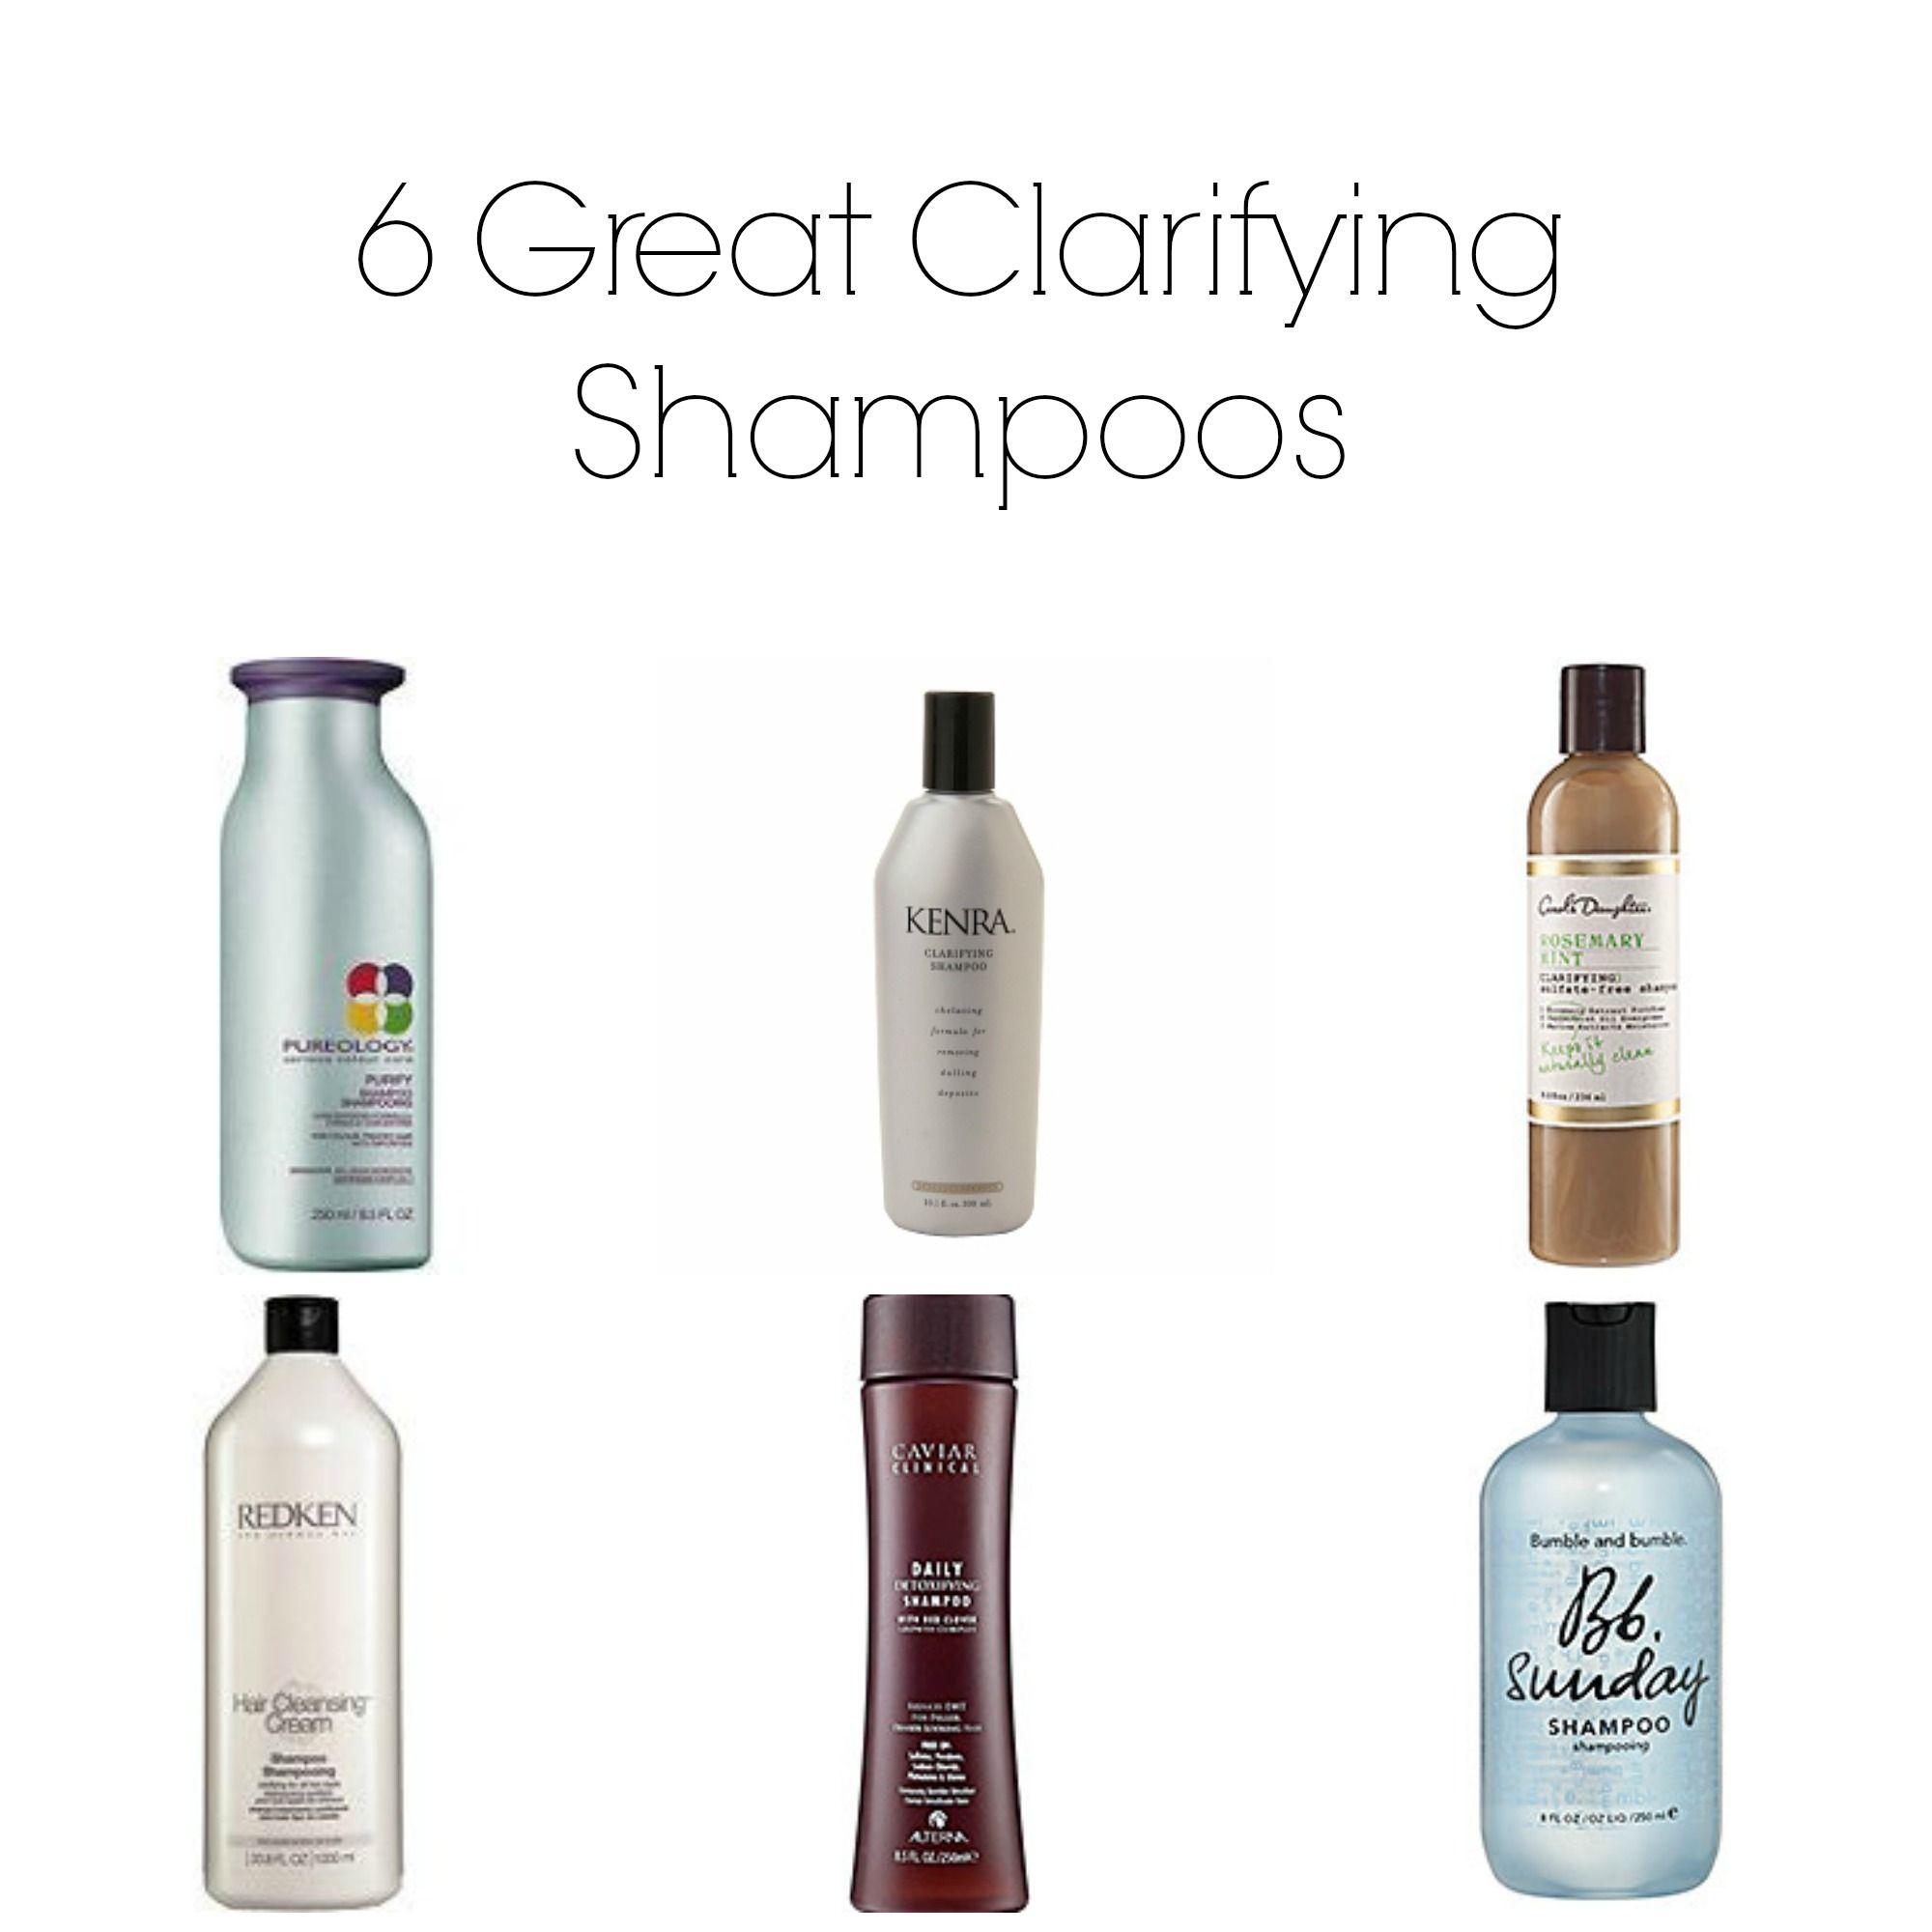 6 Great Clarifying Shampoos | She's a curly girl | Shampoo